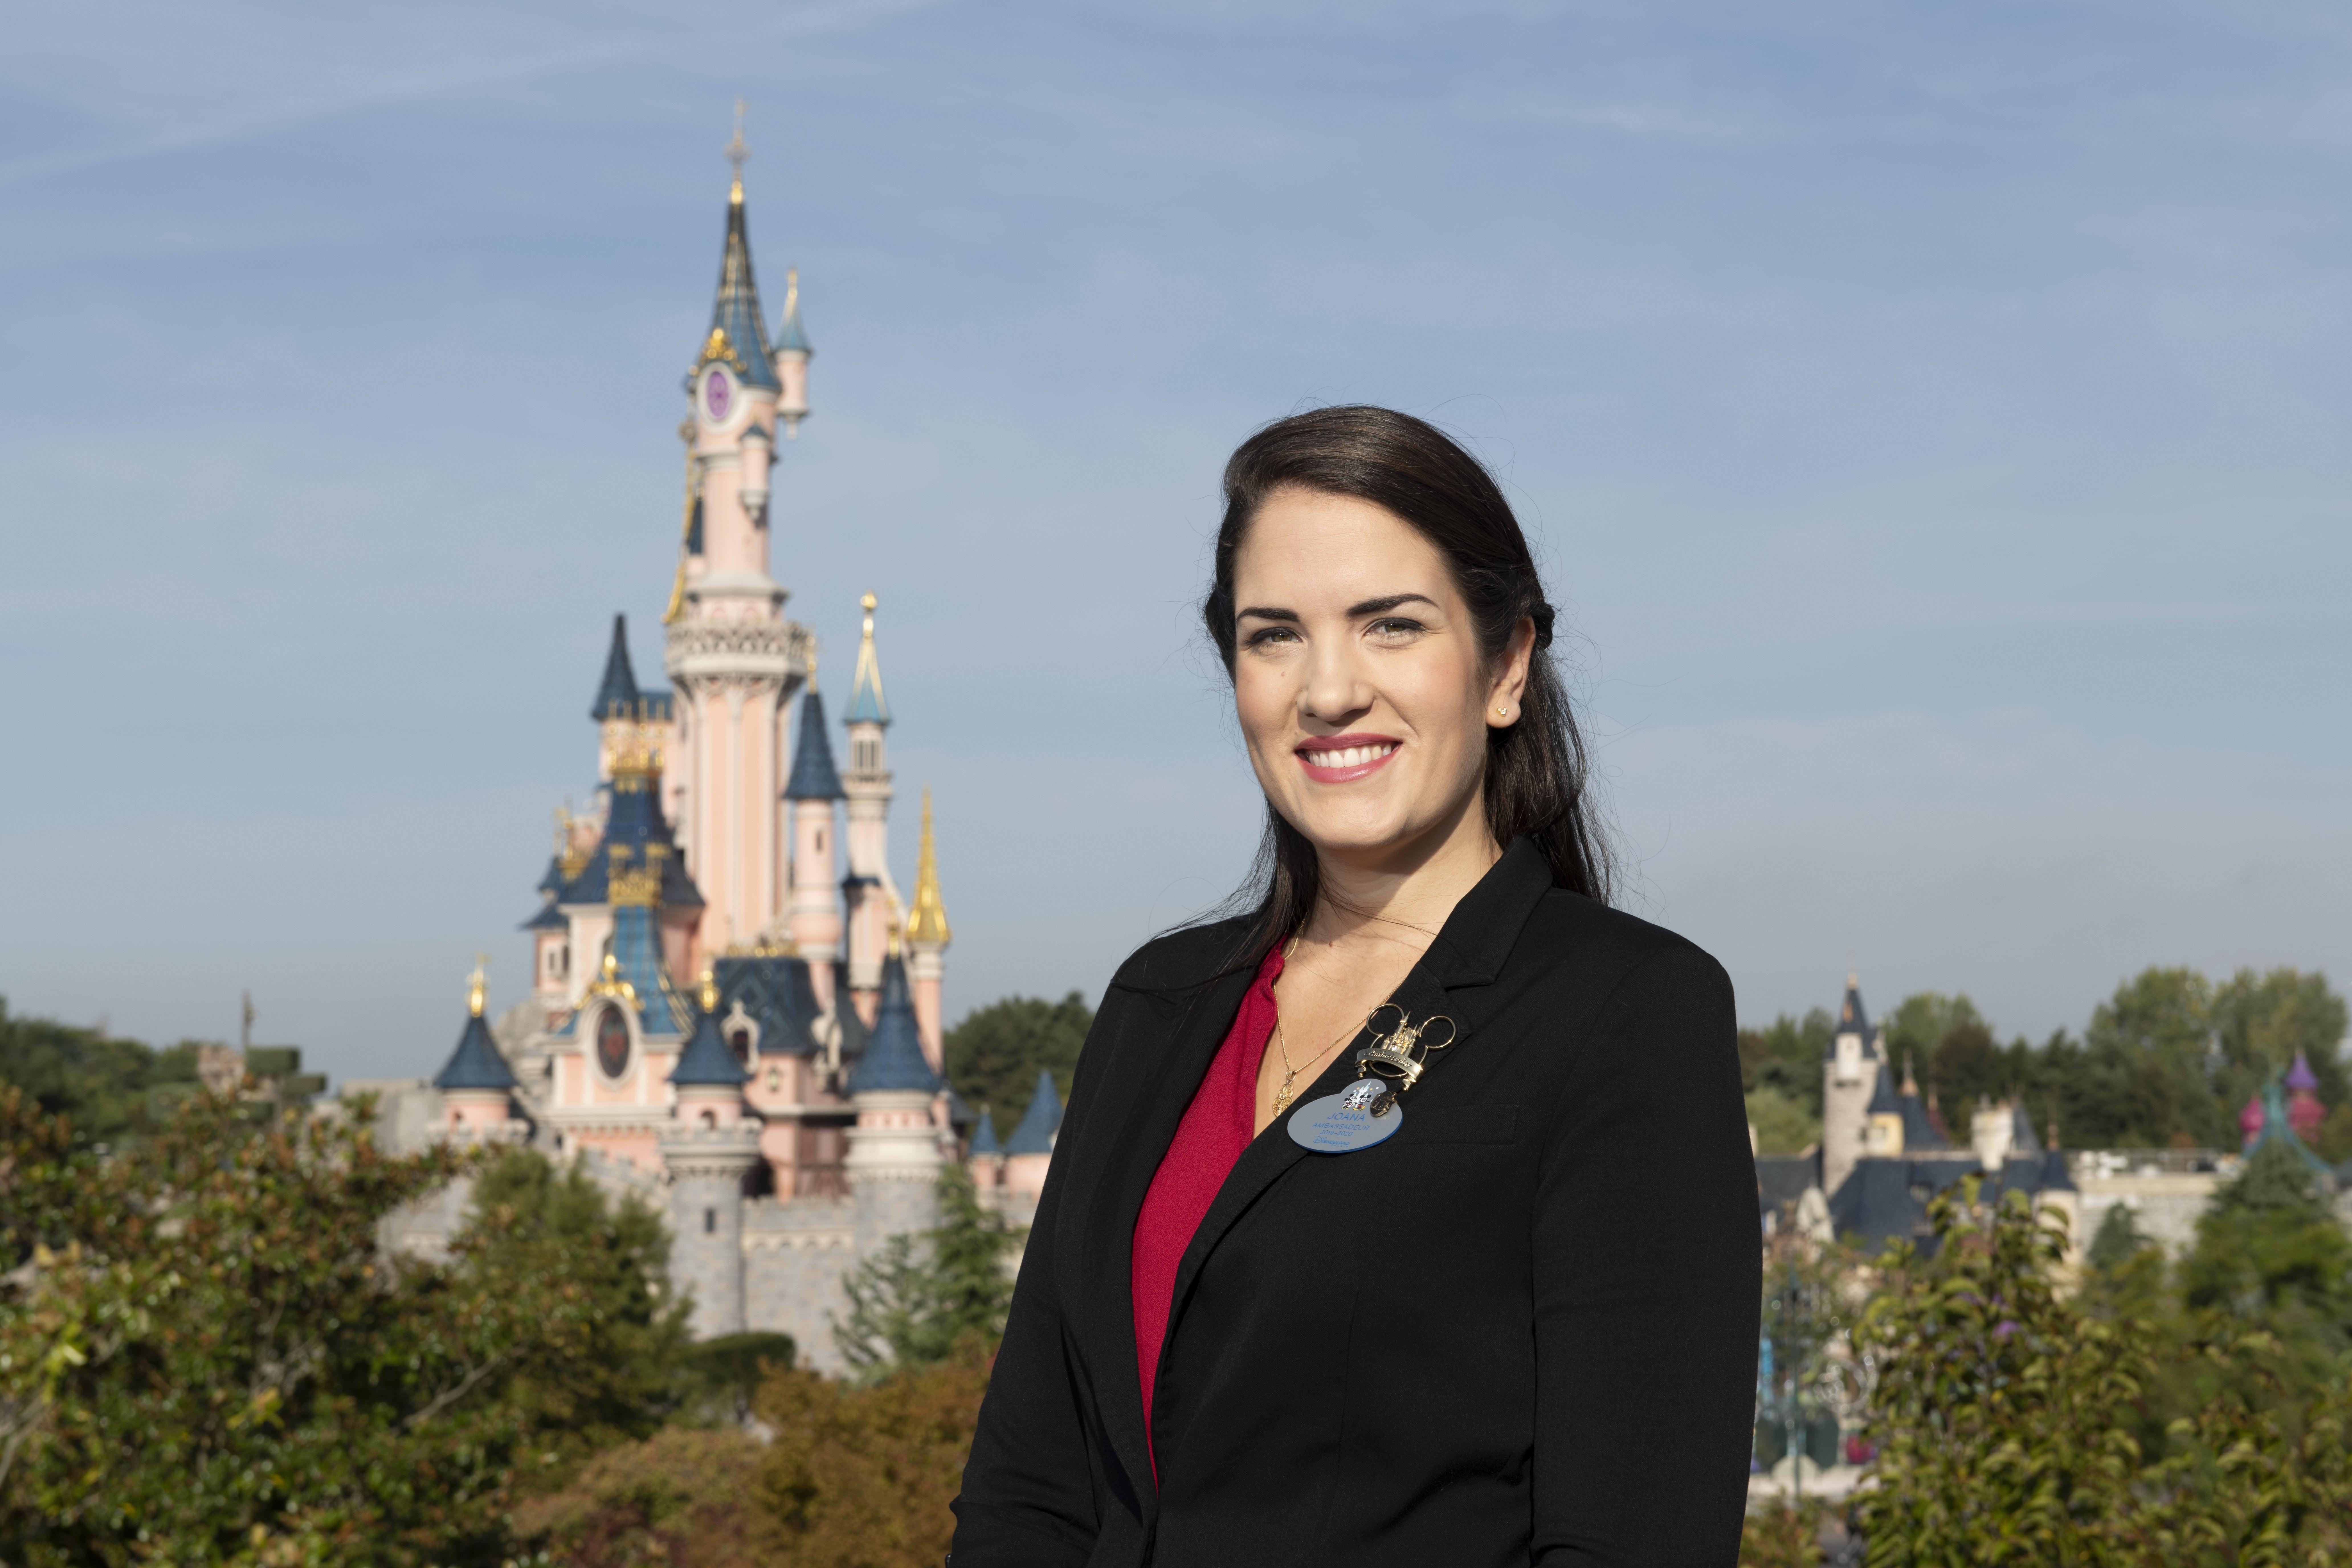 Joana Afonso Santiago, Ambassadrice Disneyland Paris 2019-2020